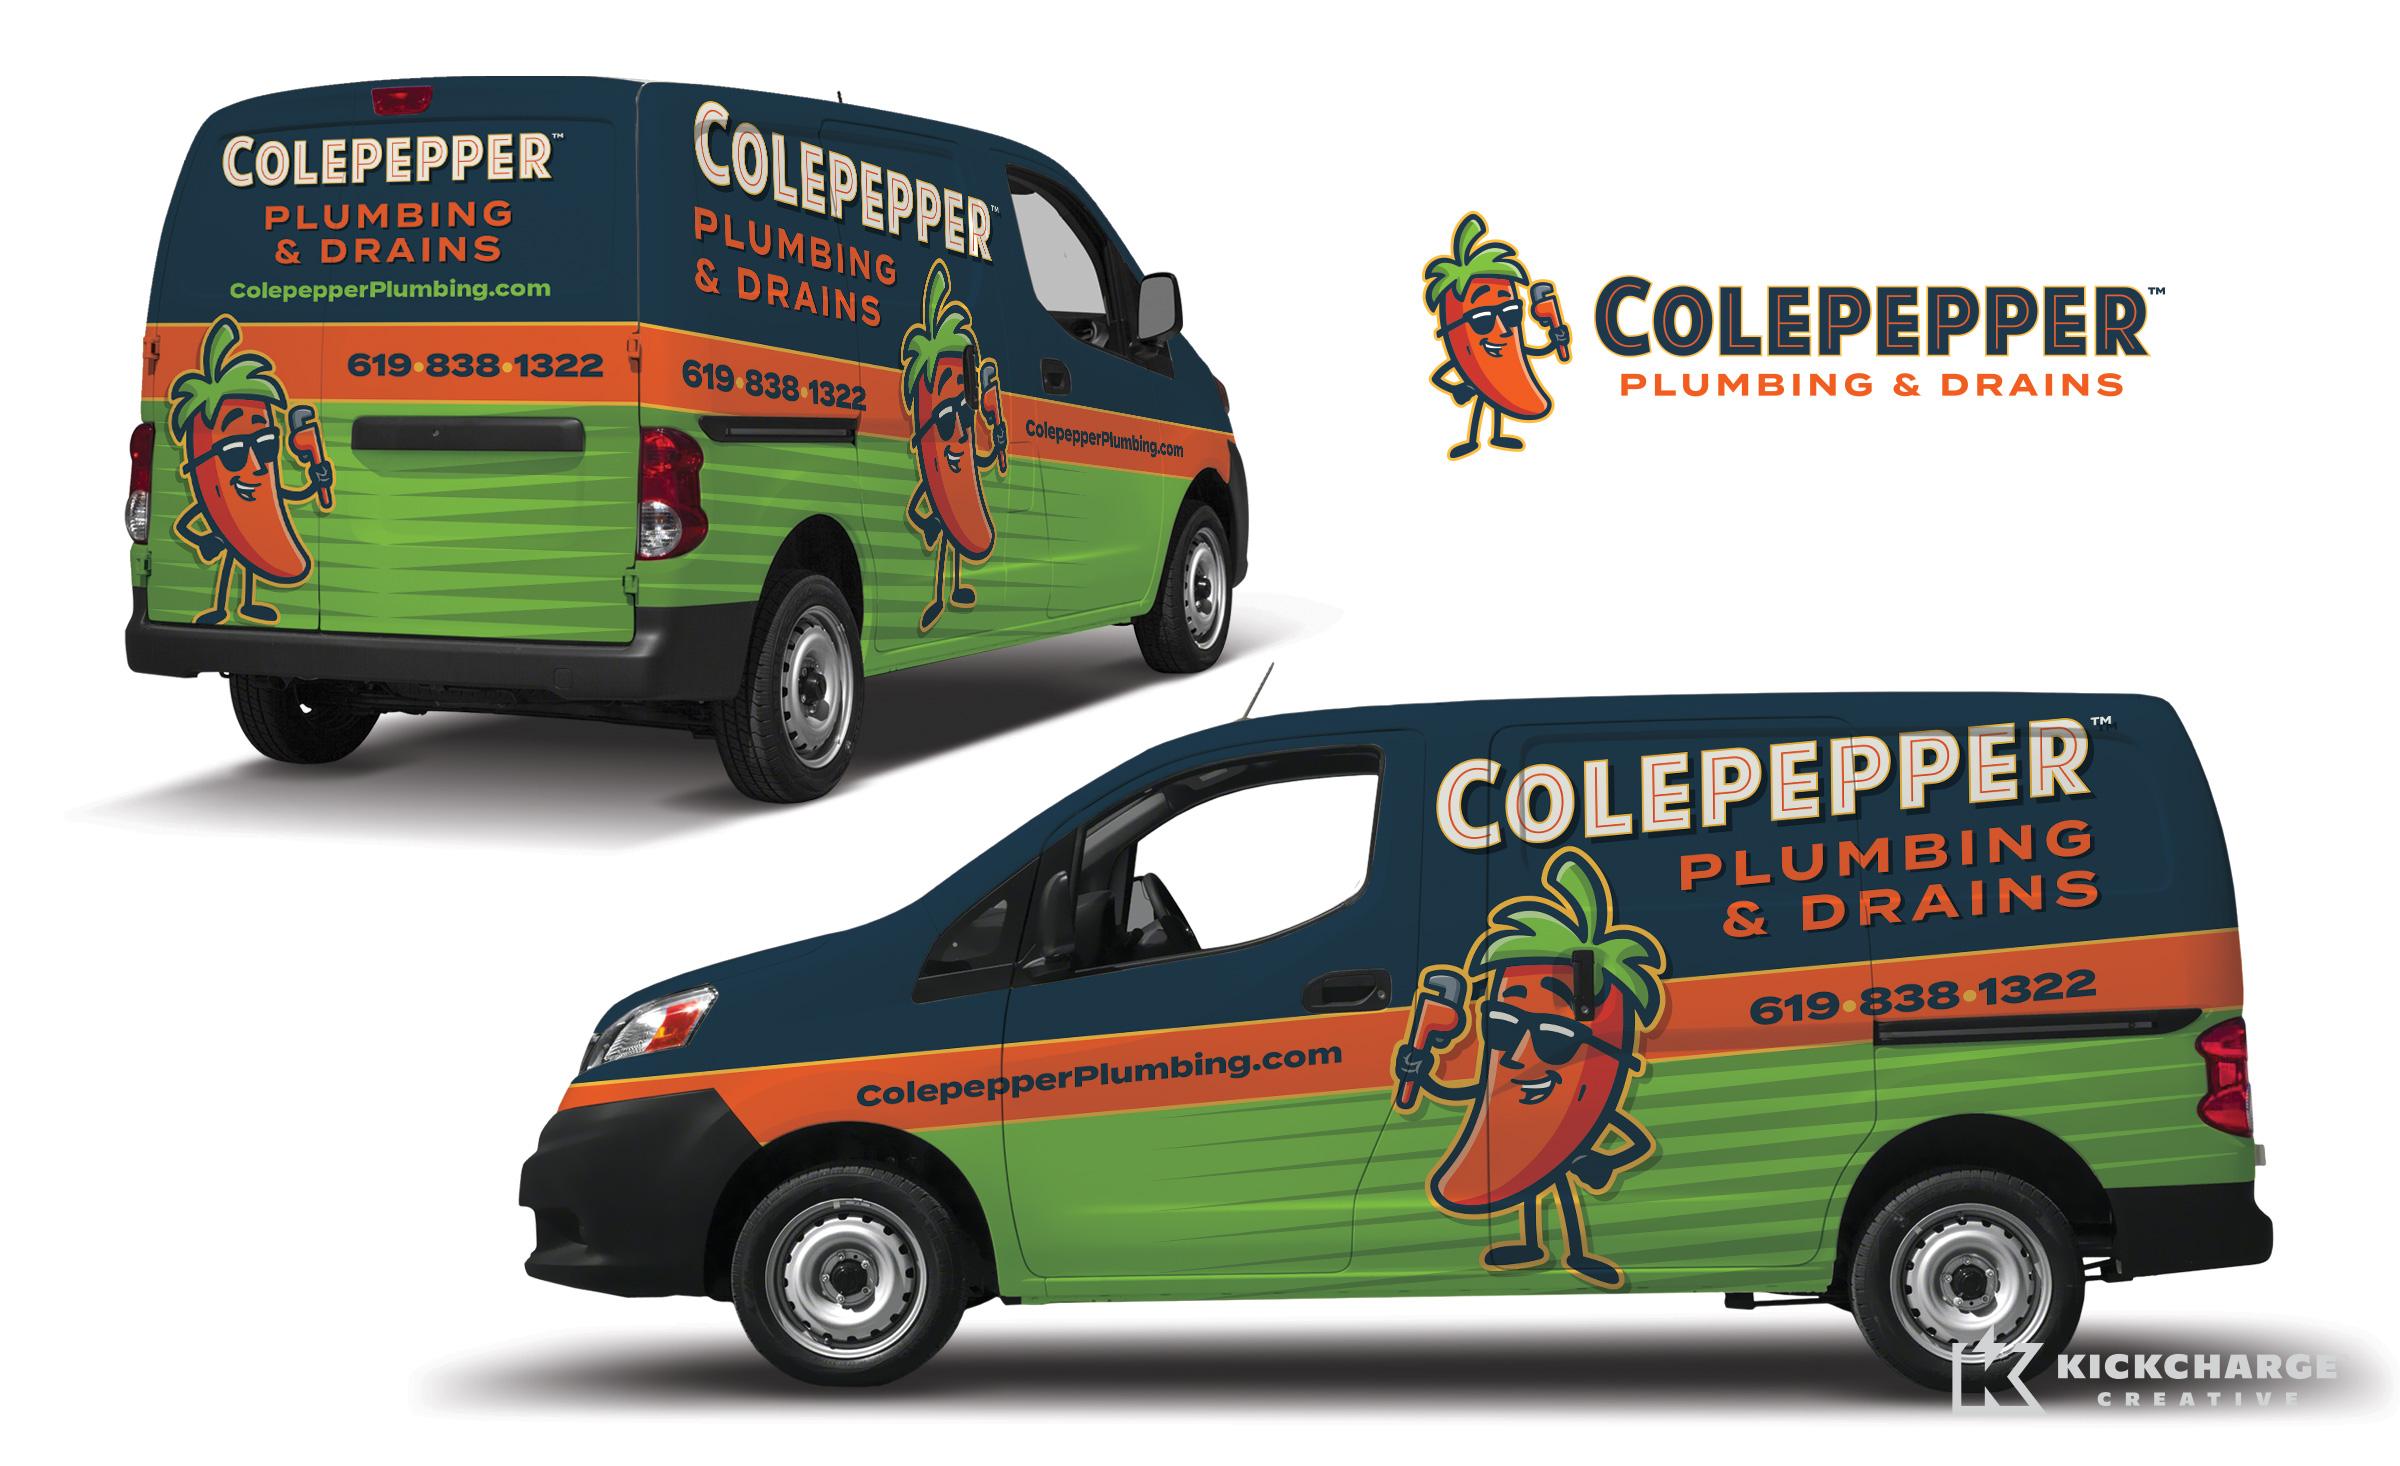 Colepepper Plumbing & Drains